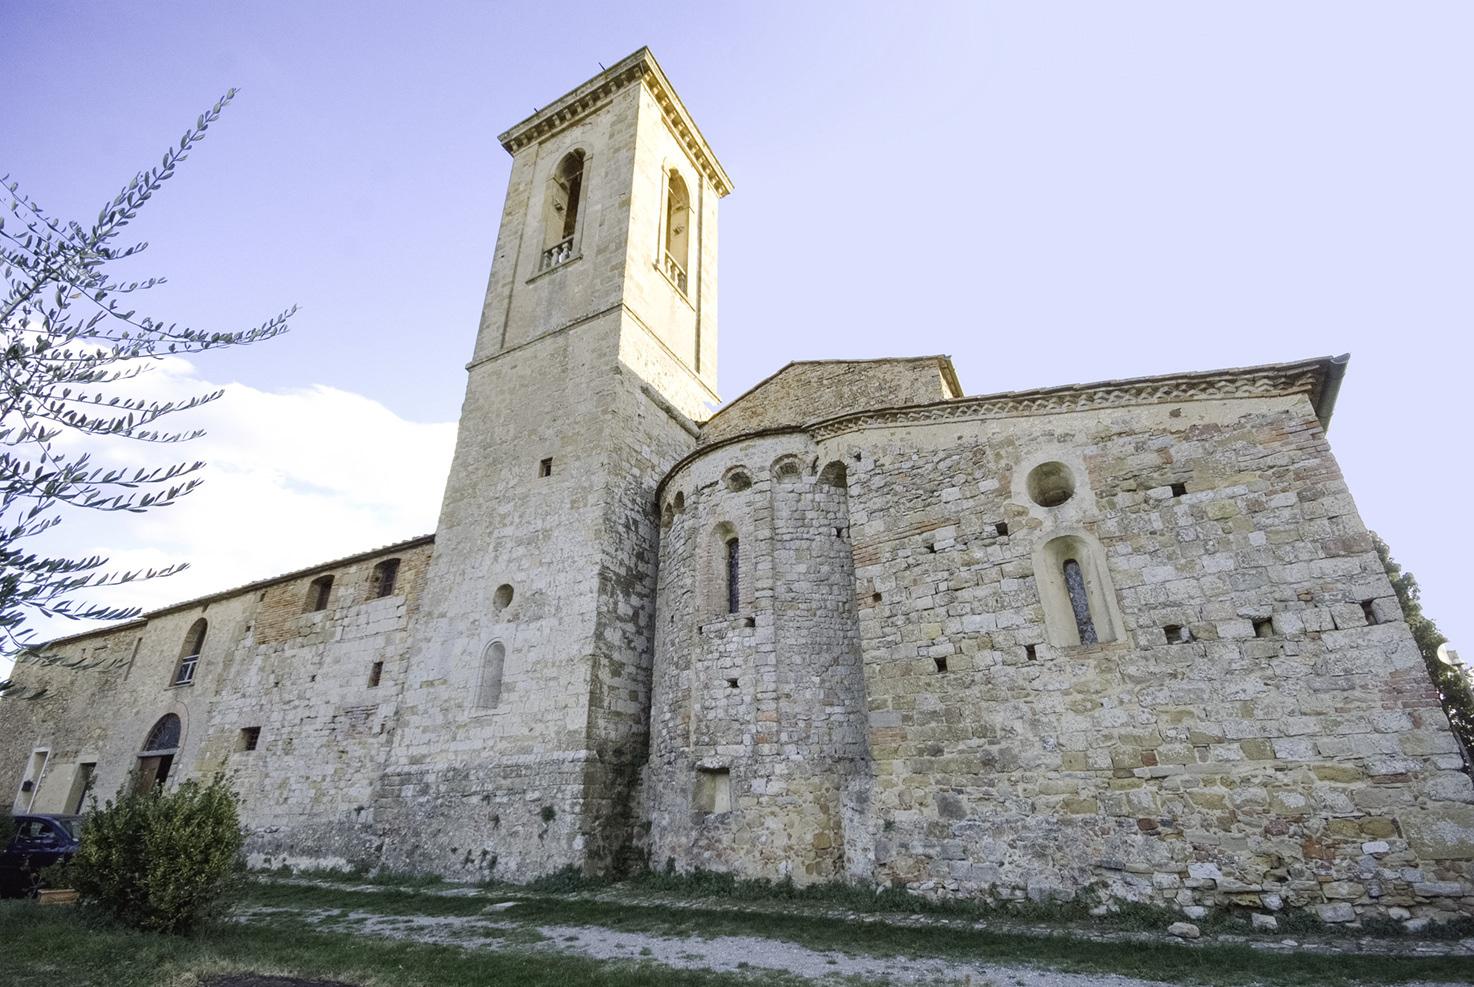 Exterior of Pieve di Sant'Appiano